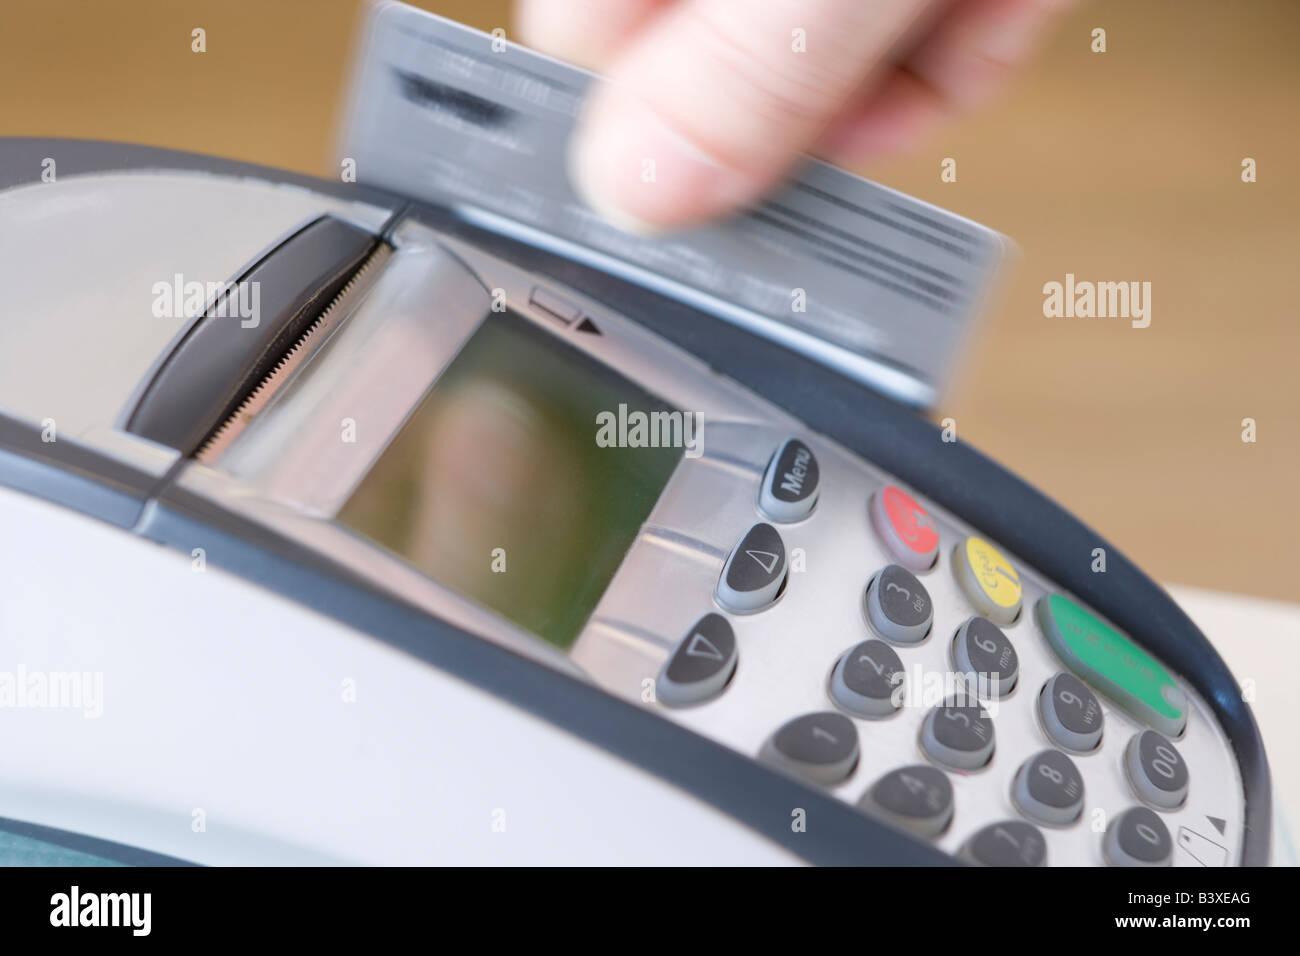 Swiping Credit Card - Stock Image